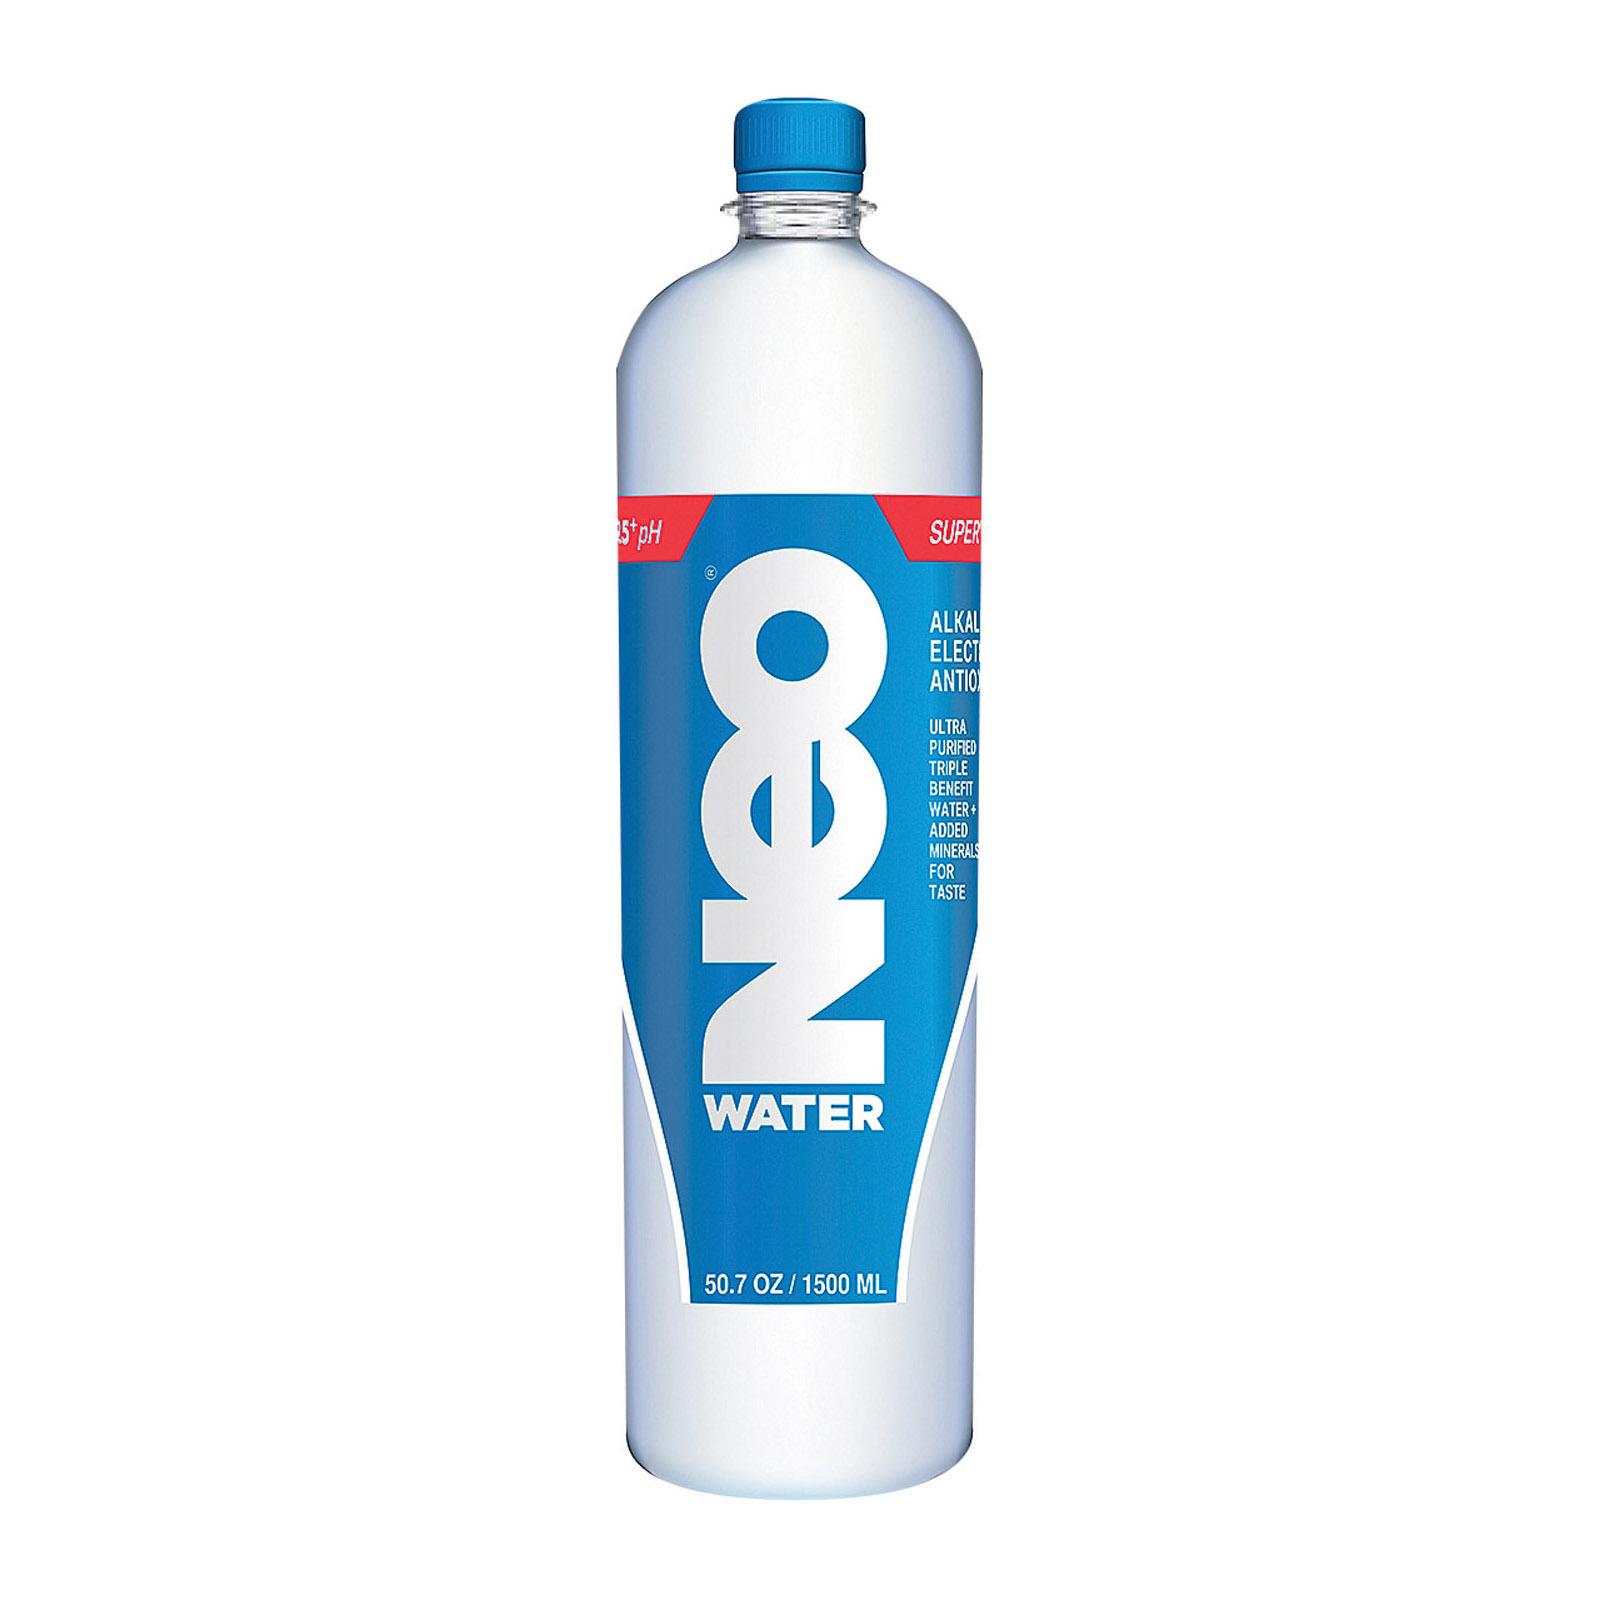 Neo Water Super Water - Case of 12 - 50.7 Fl oz.